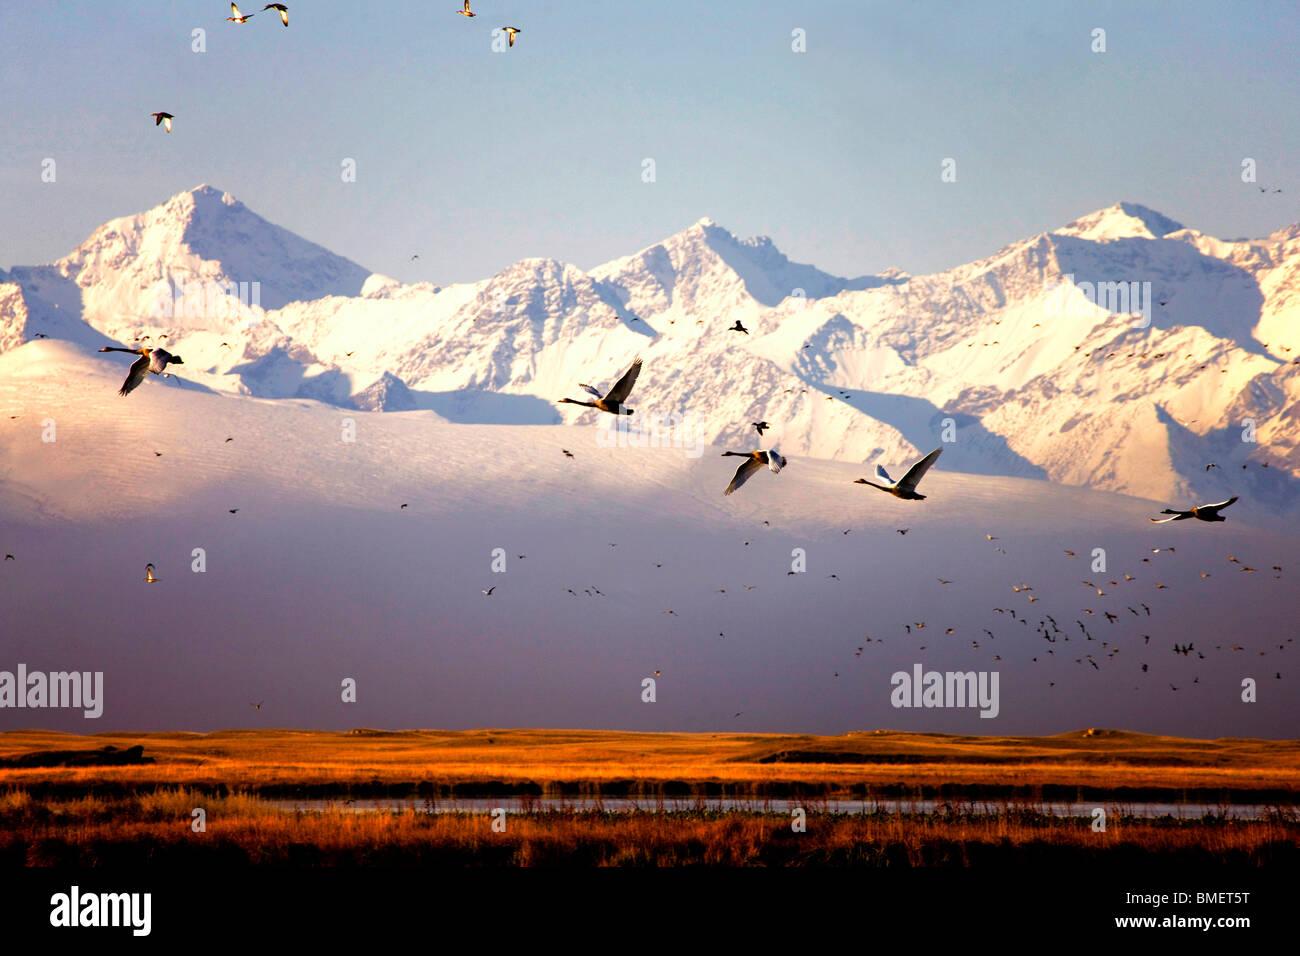 Swans flying, Swan Lake, Bayanbulak Grasslands, Bayingolin Mongol Autonomous Prefecture, Xinjiang, China - Stock Image